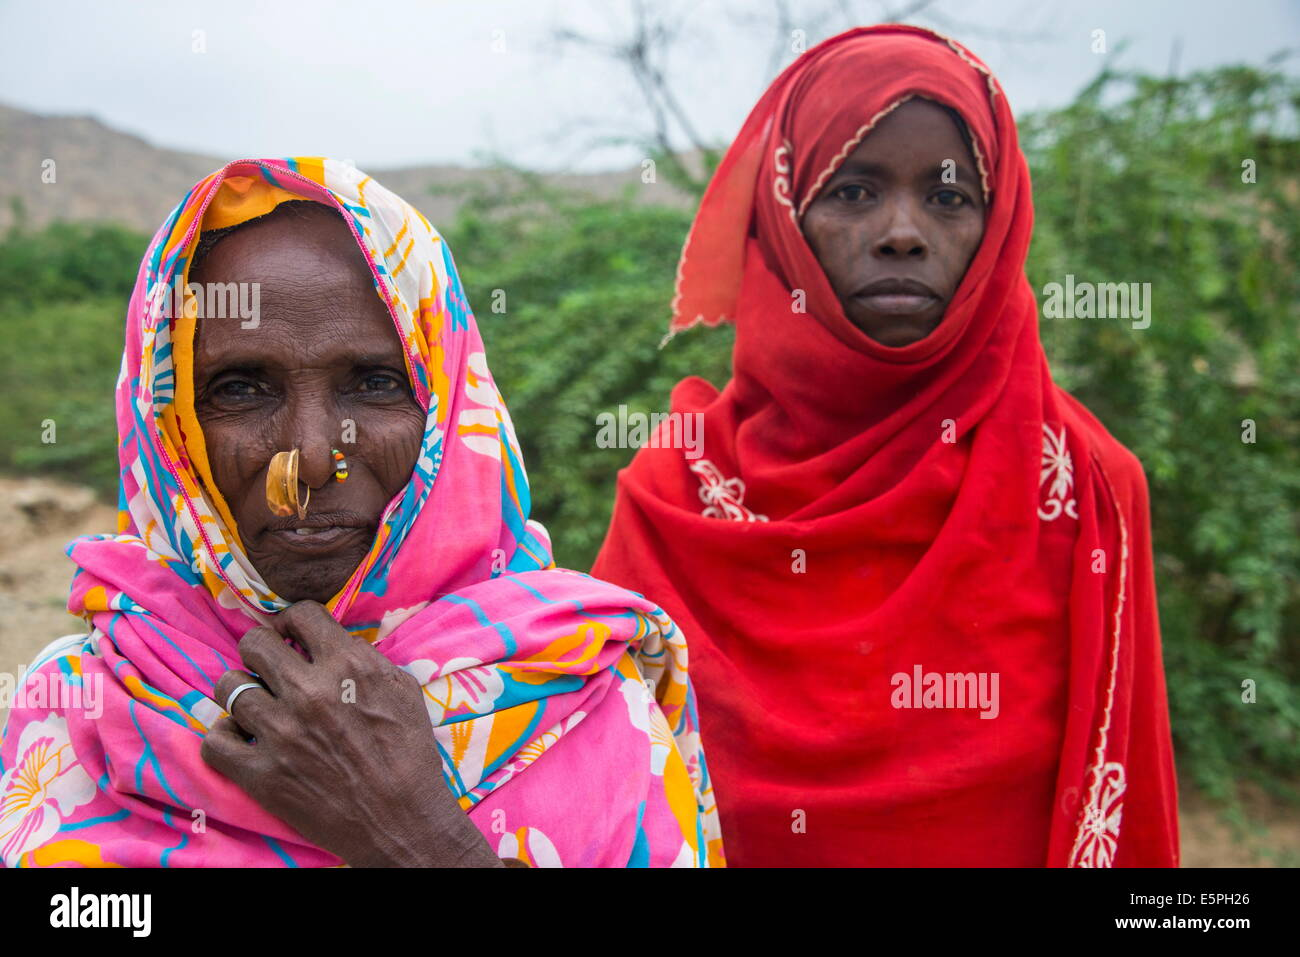 eritrean stock photos & eritrean stock images - alamy